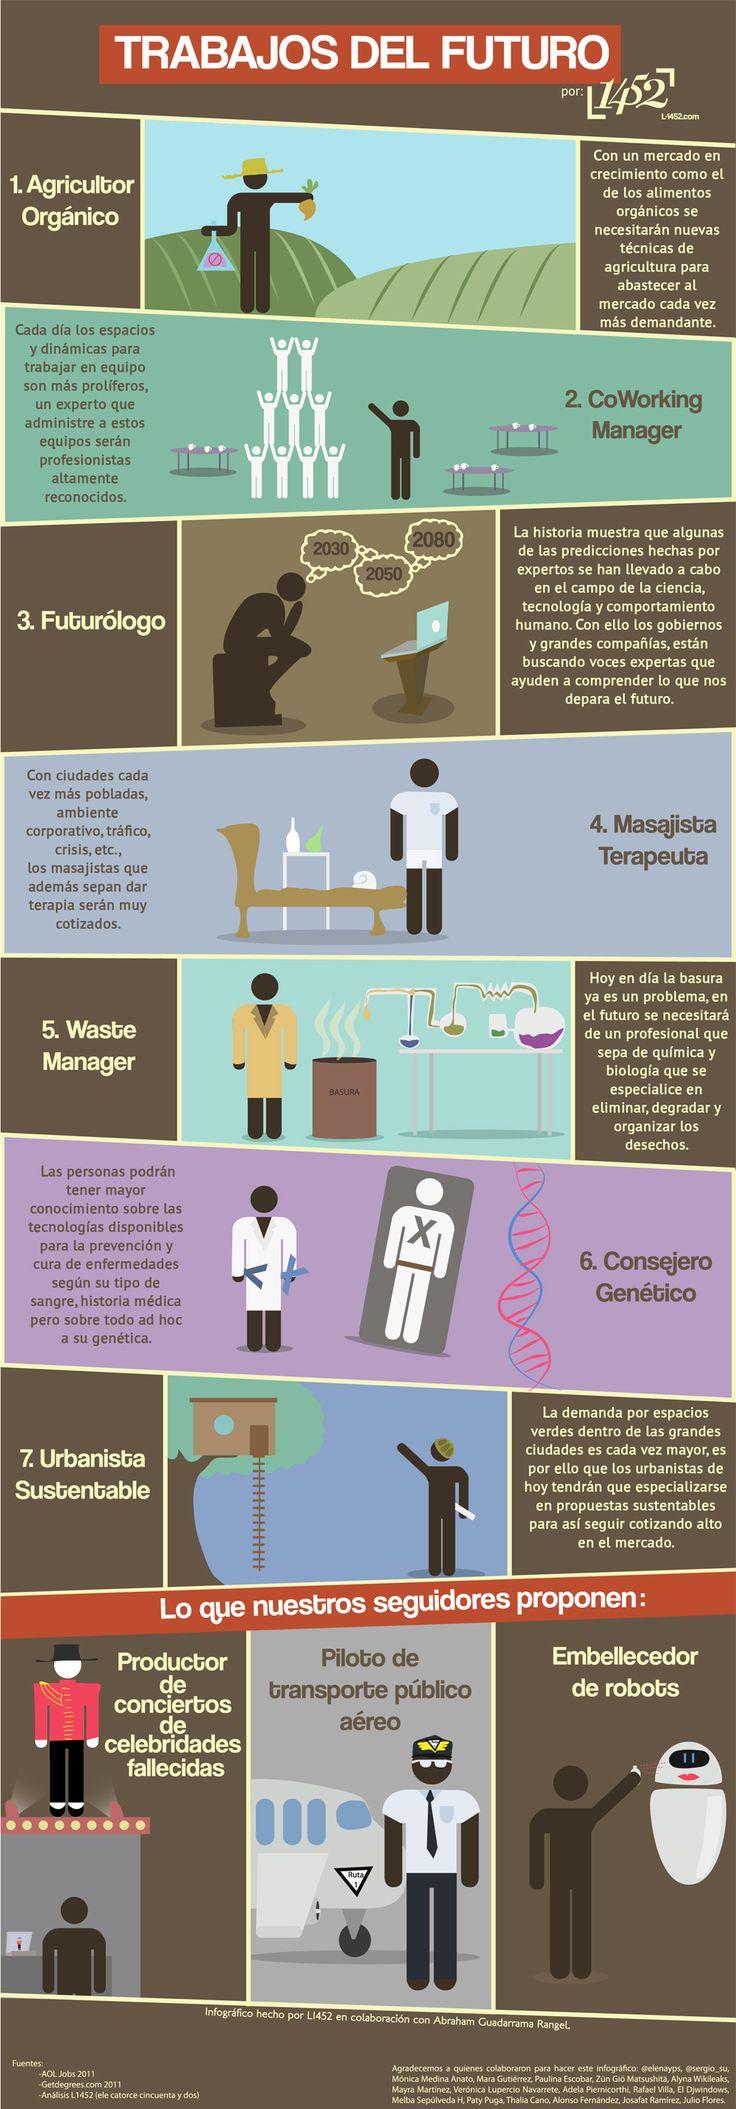 B1 - Profesiones: ¿Cuáles serán las profesiones del futuro? http://erafbadia.blogspot.com/ @erafbadia #empleo #infografia